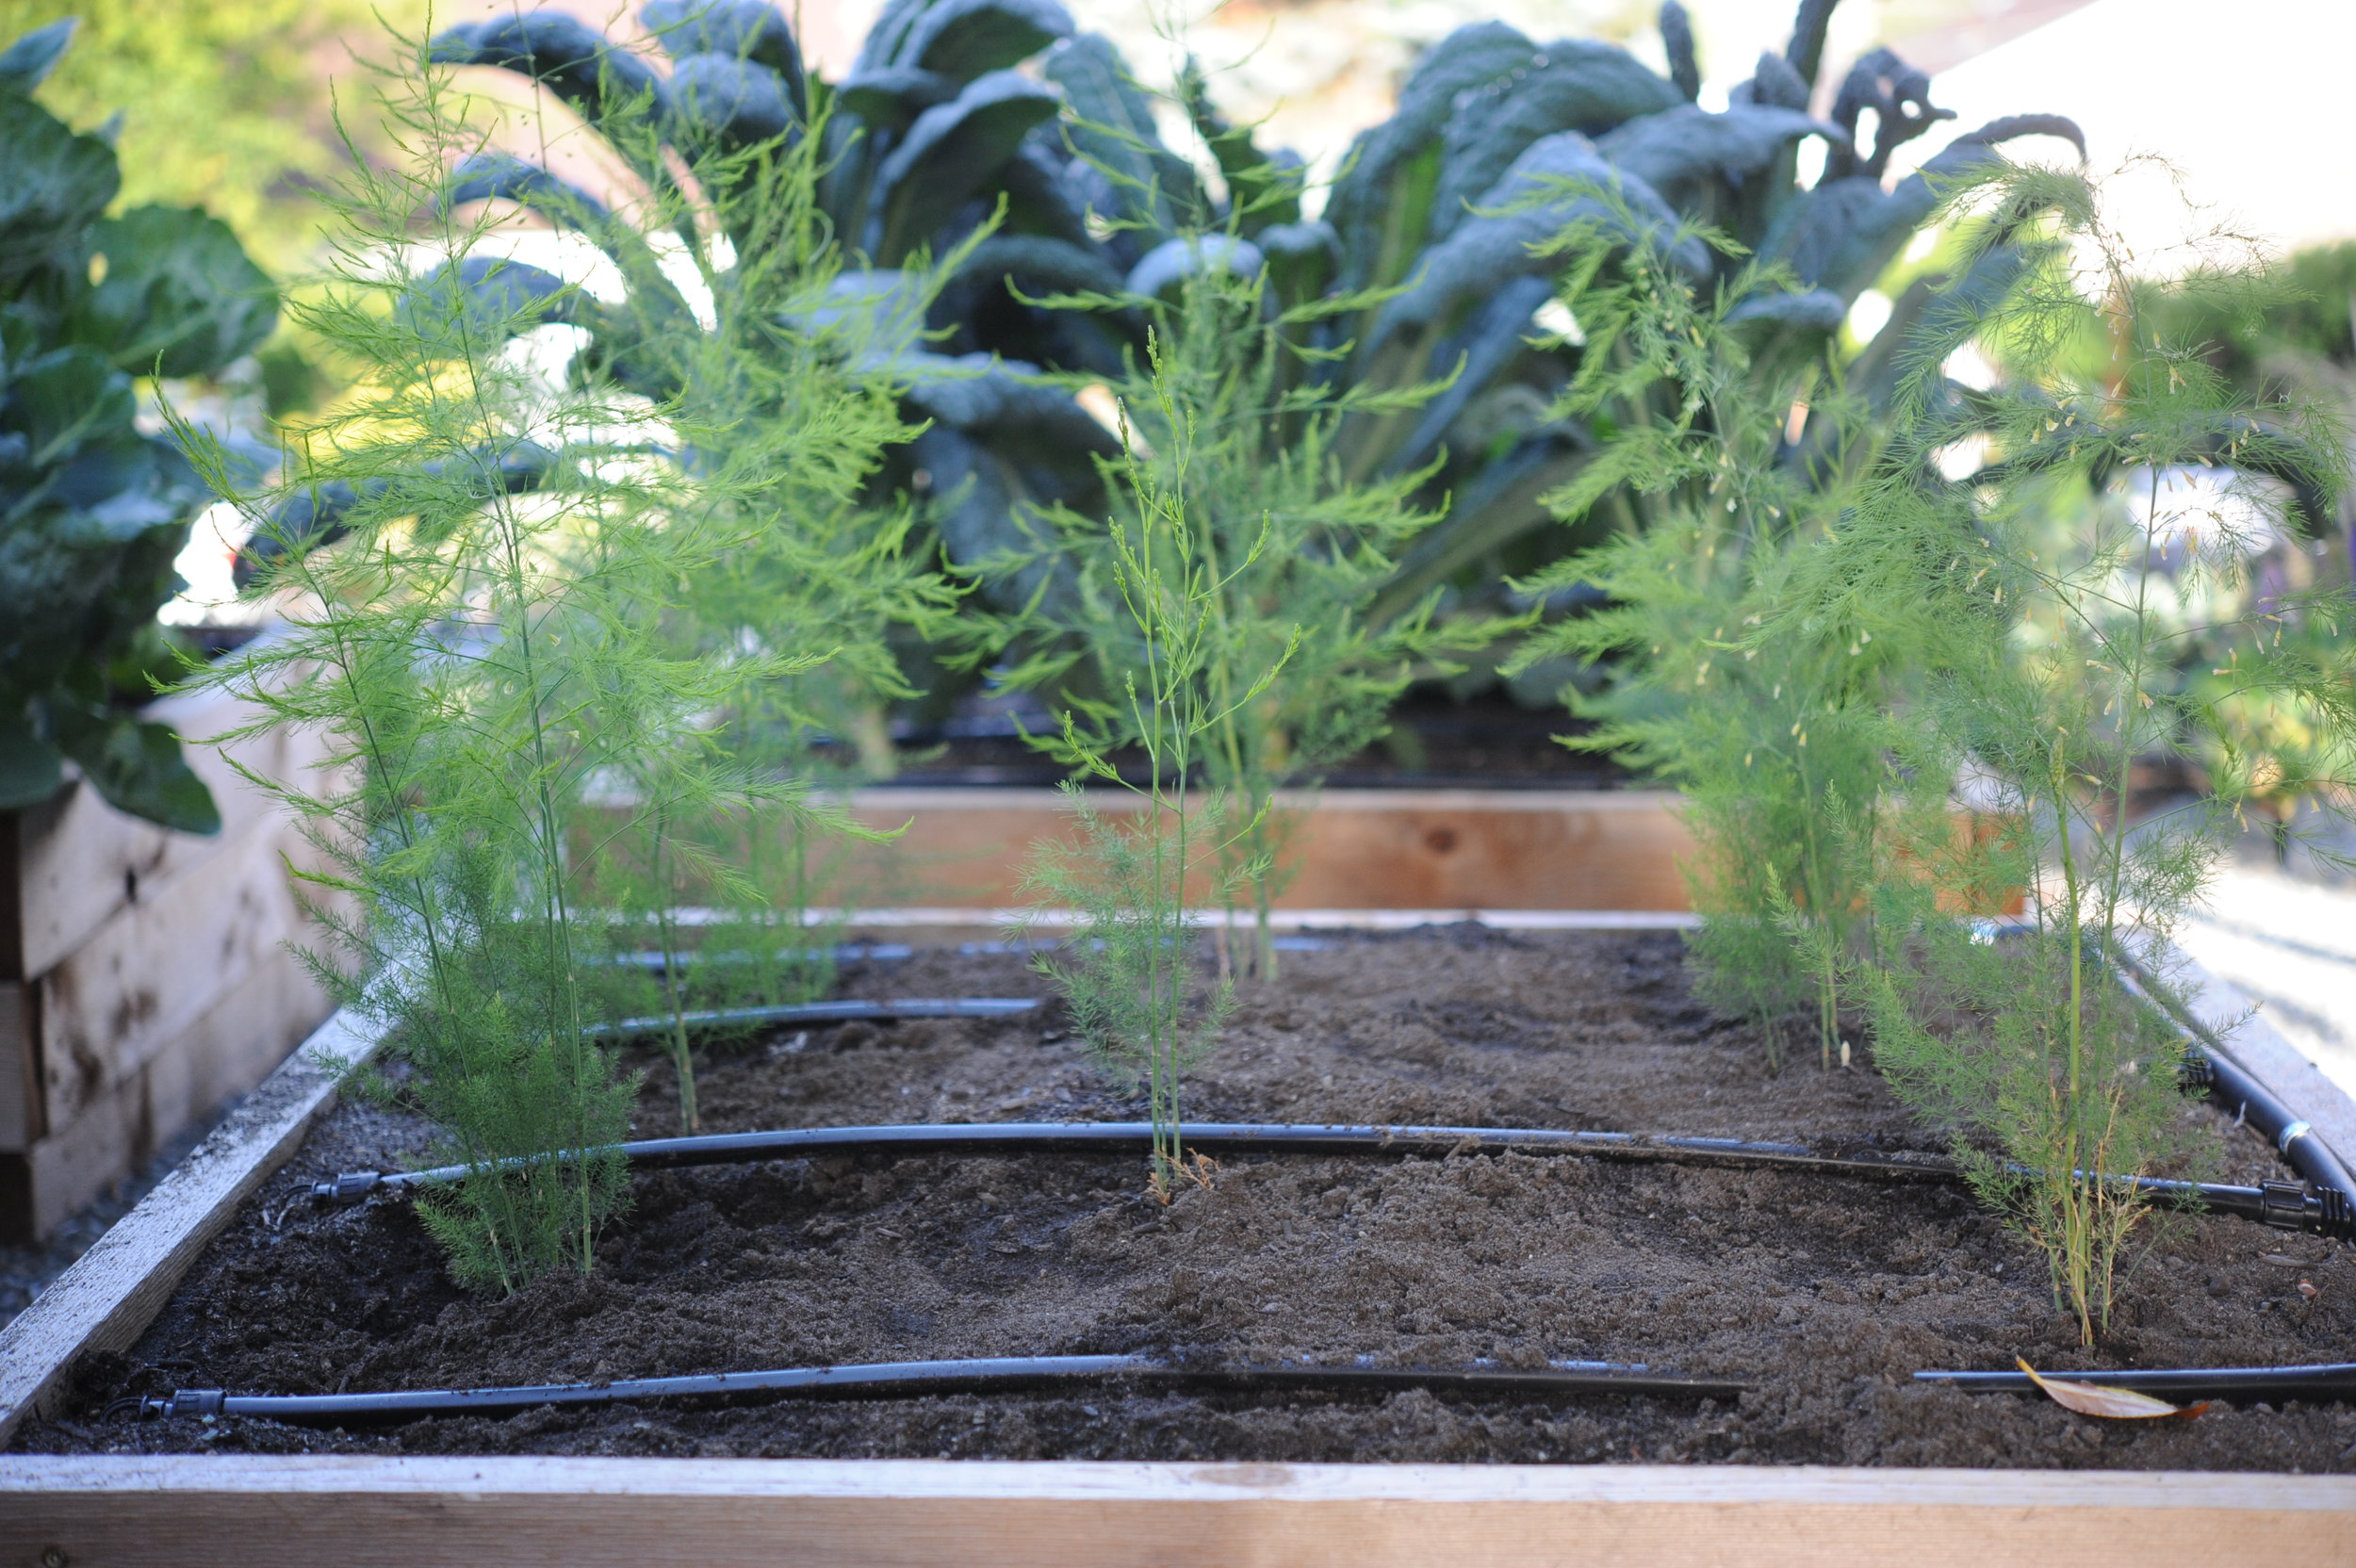 First year asparagus growth